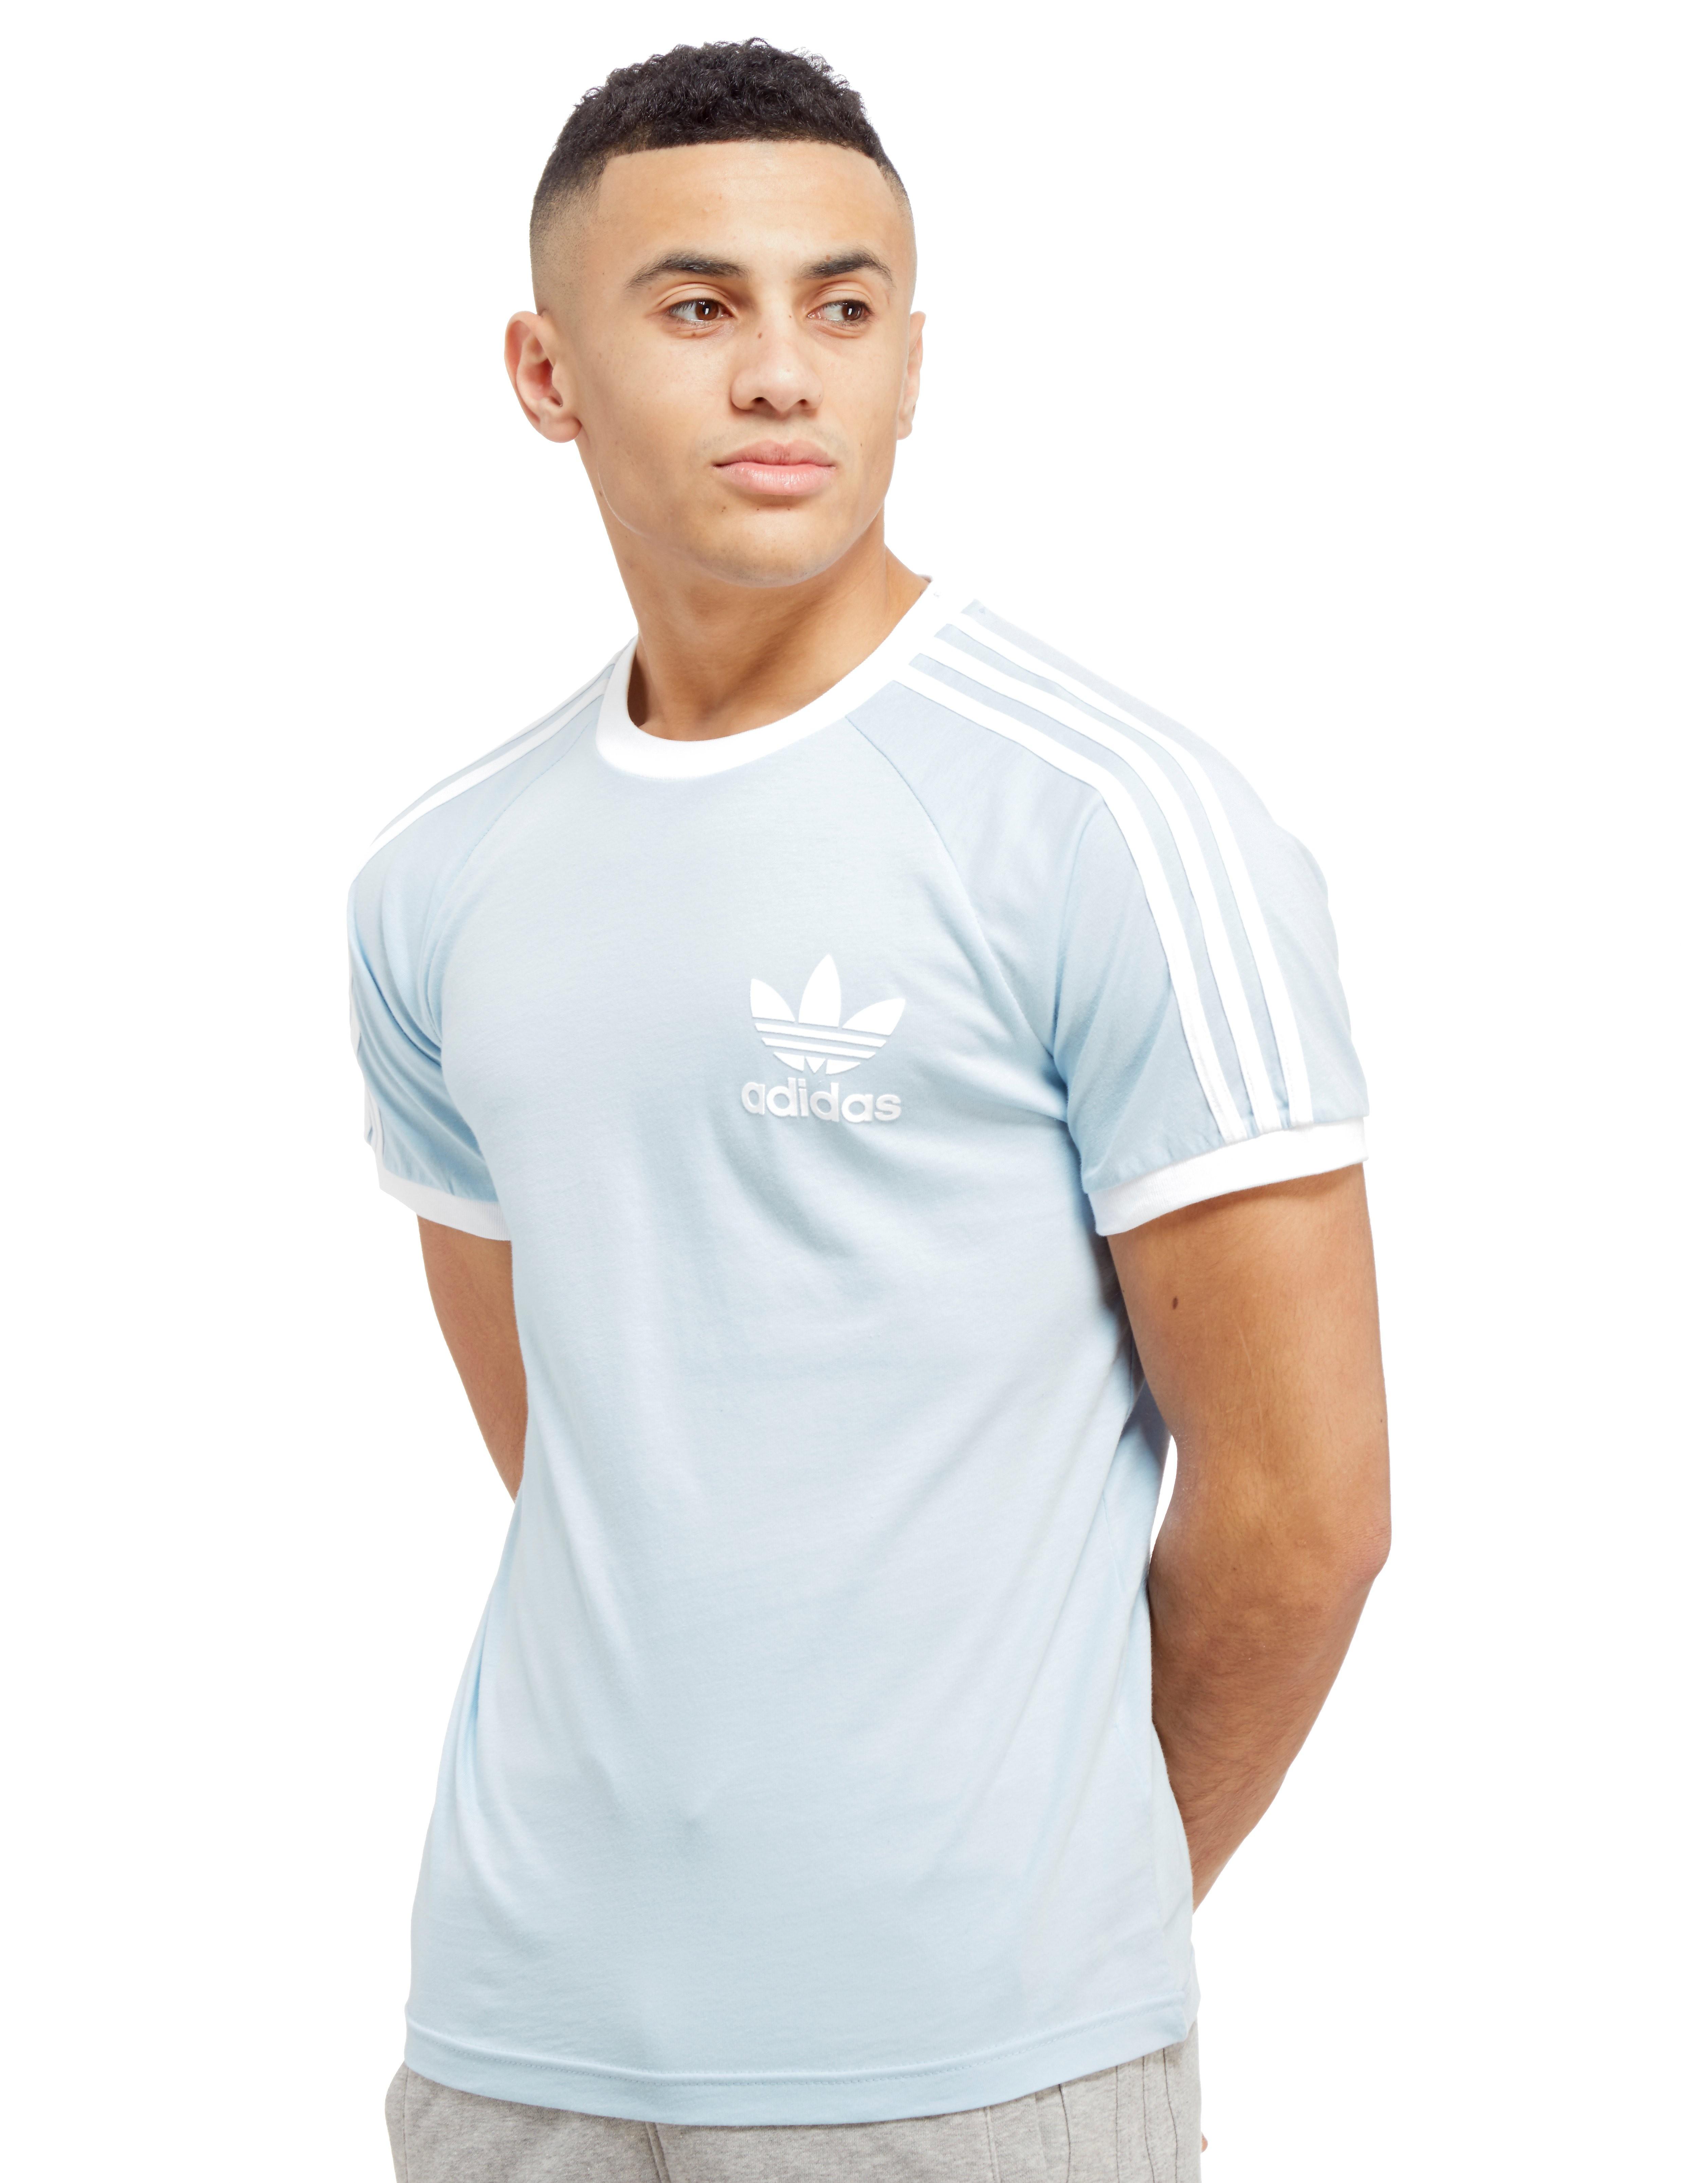 adidas Originals T-shirt California Short Sleeve Homme